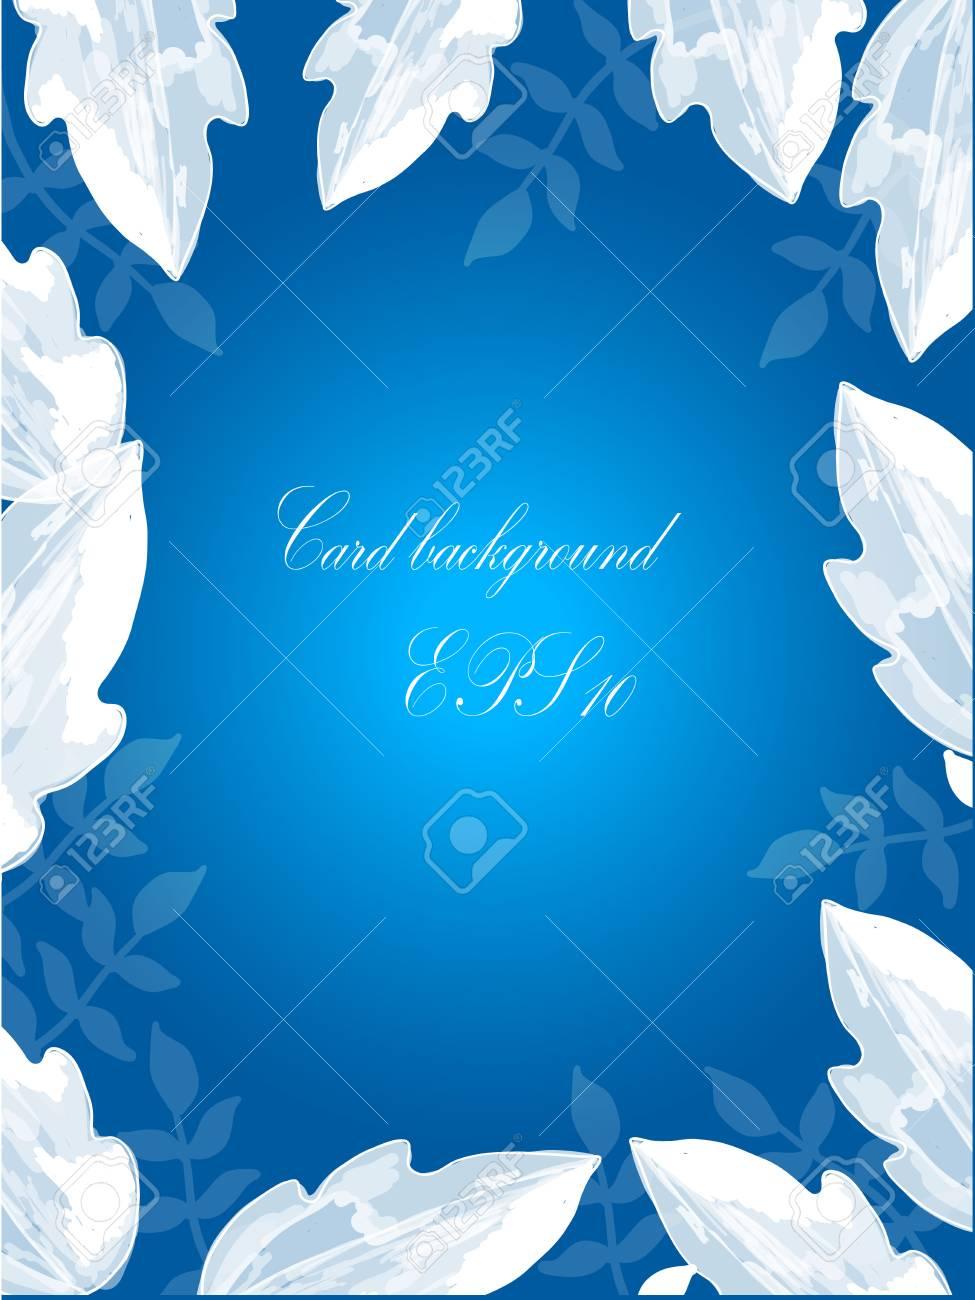 blue invitation card background design and white leaf